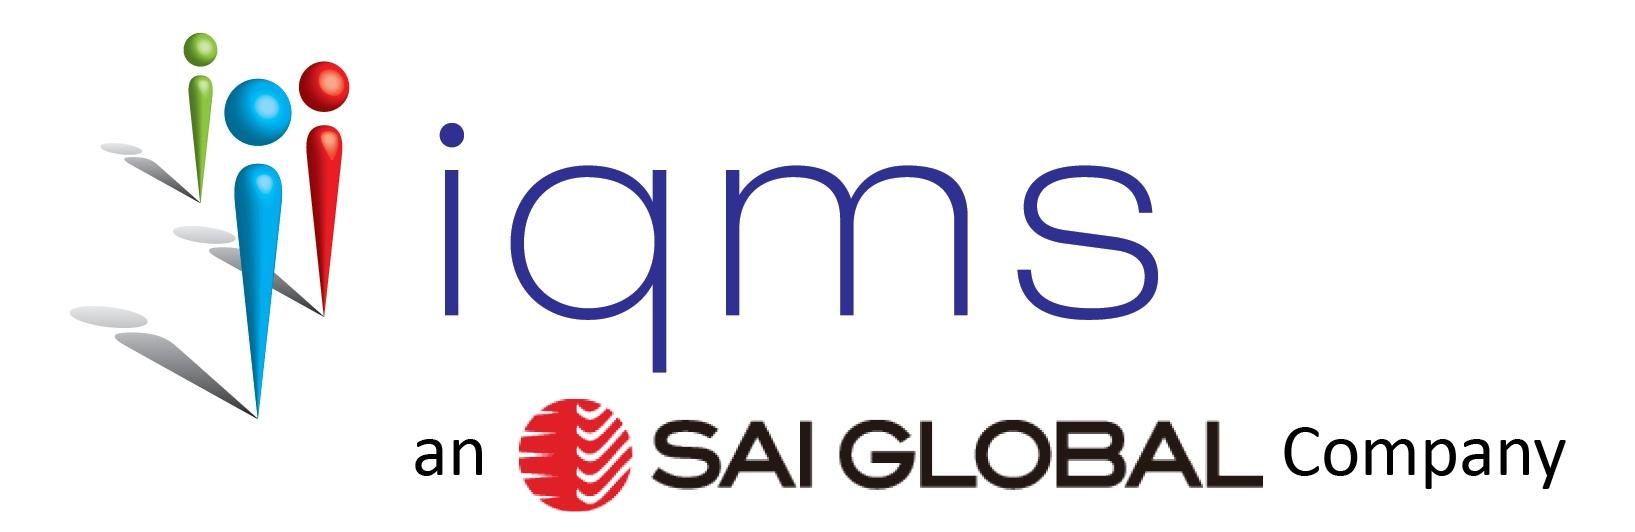 CIWM WasteSmart Centre Profile - IQMS